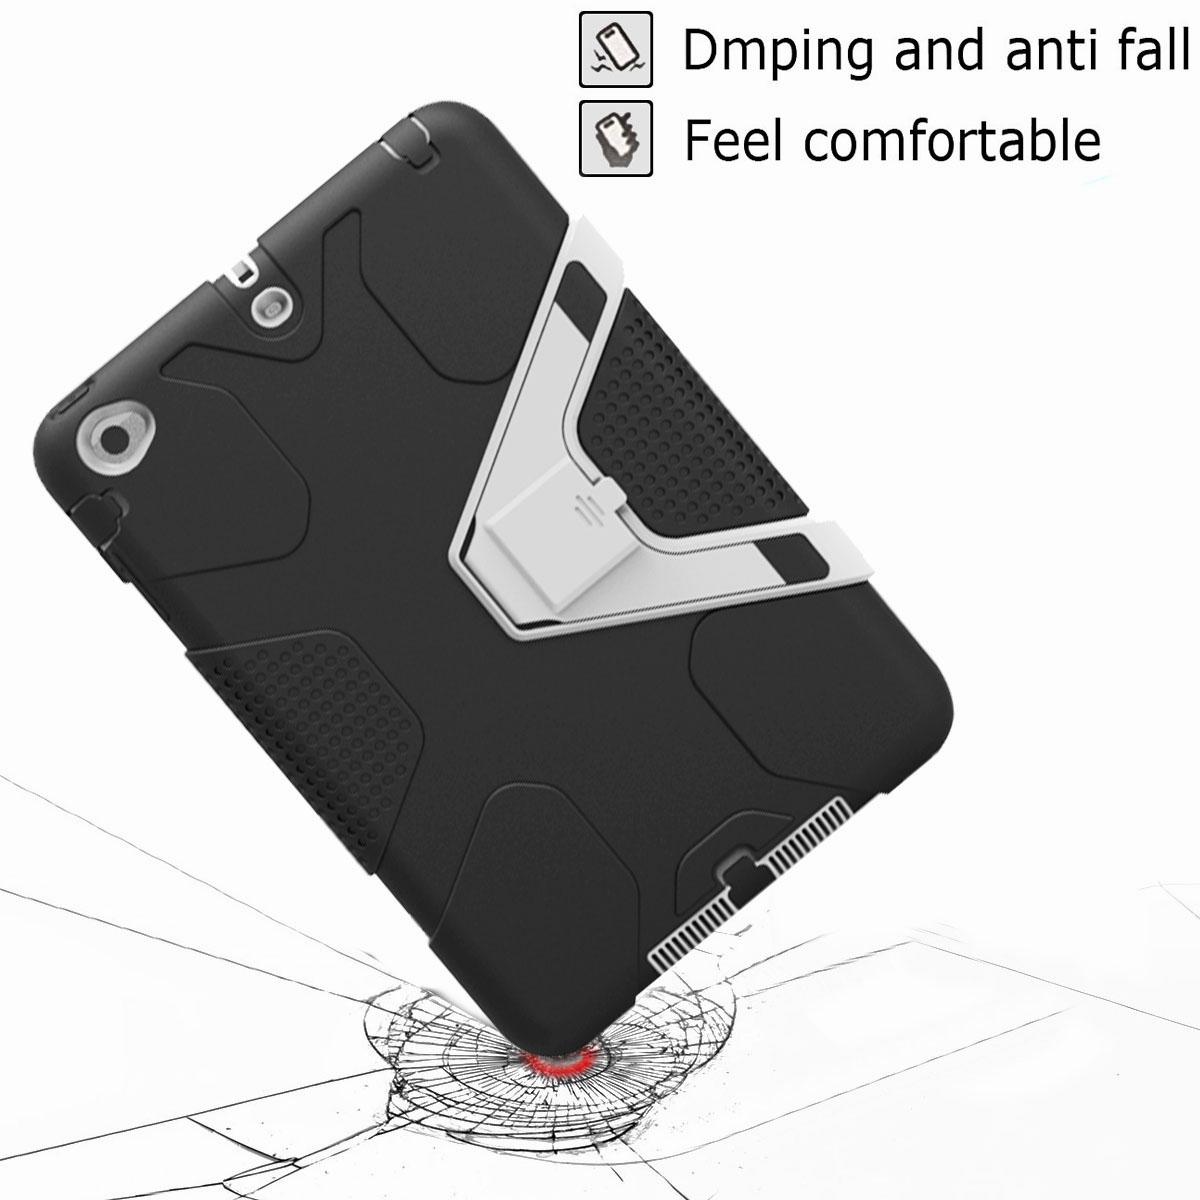 Luxury-Shockproof-Tough-Armor-with-Hard-Kickstand-Case-For-Apple-iPad-Mini-1-2-3 thumbnail 55